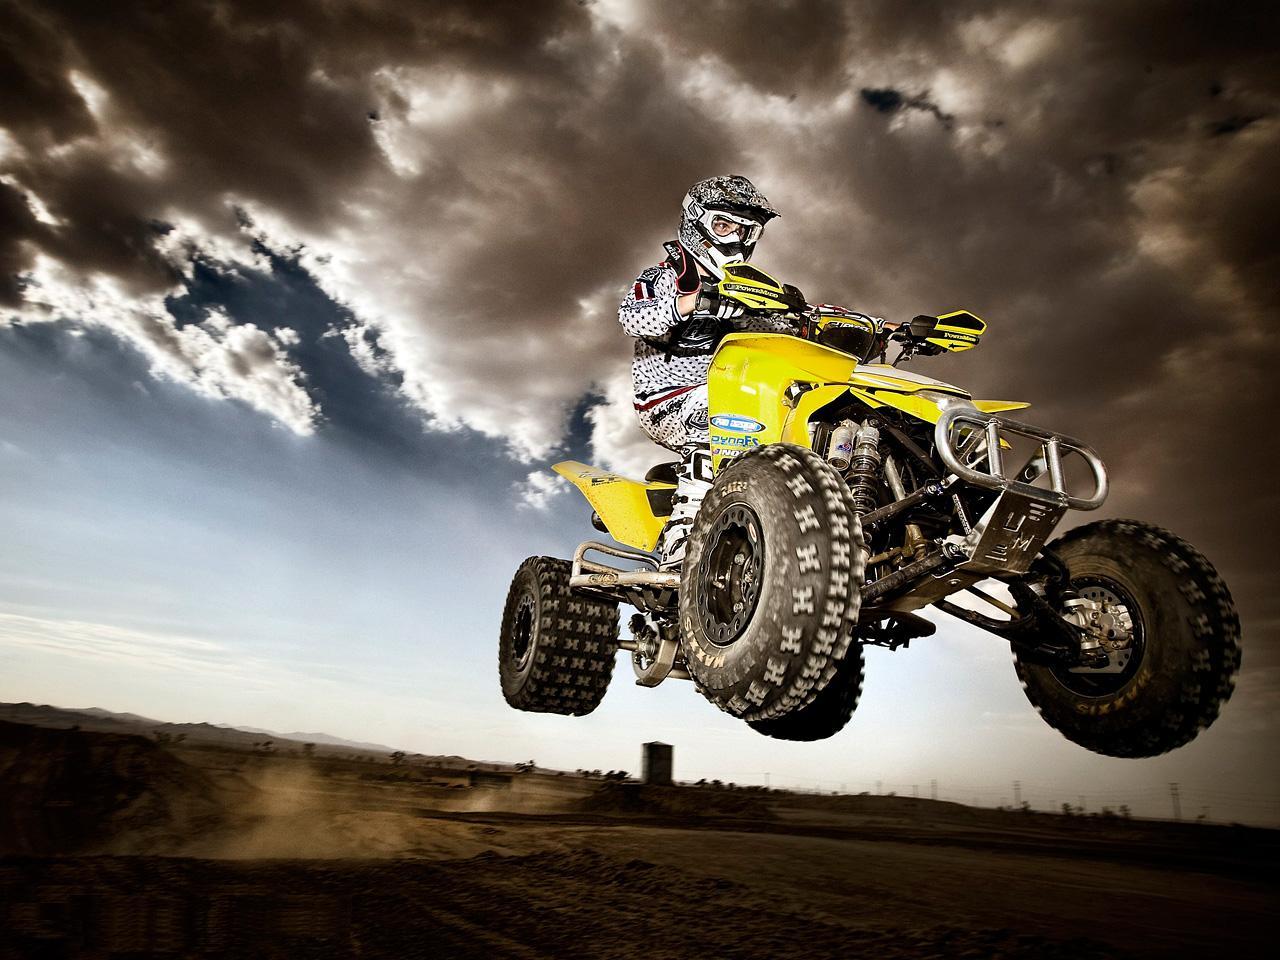 Motorcycle Racing On The Sand Suzuki Hd Desktop Mobile: [49+] Quad Wallpaper On WallpaperSafari